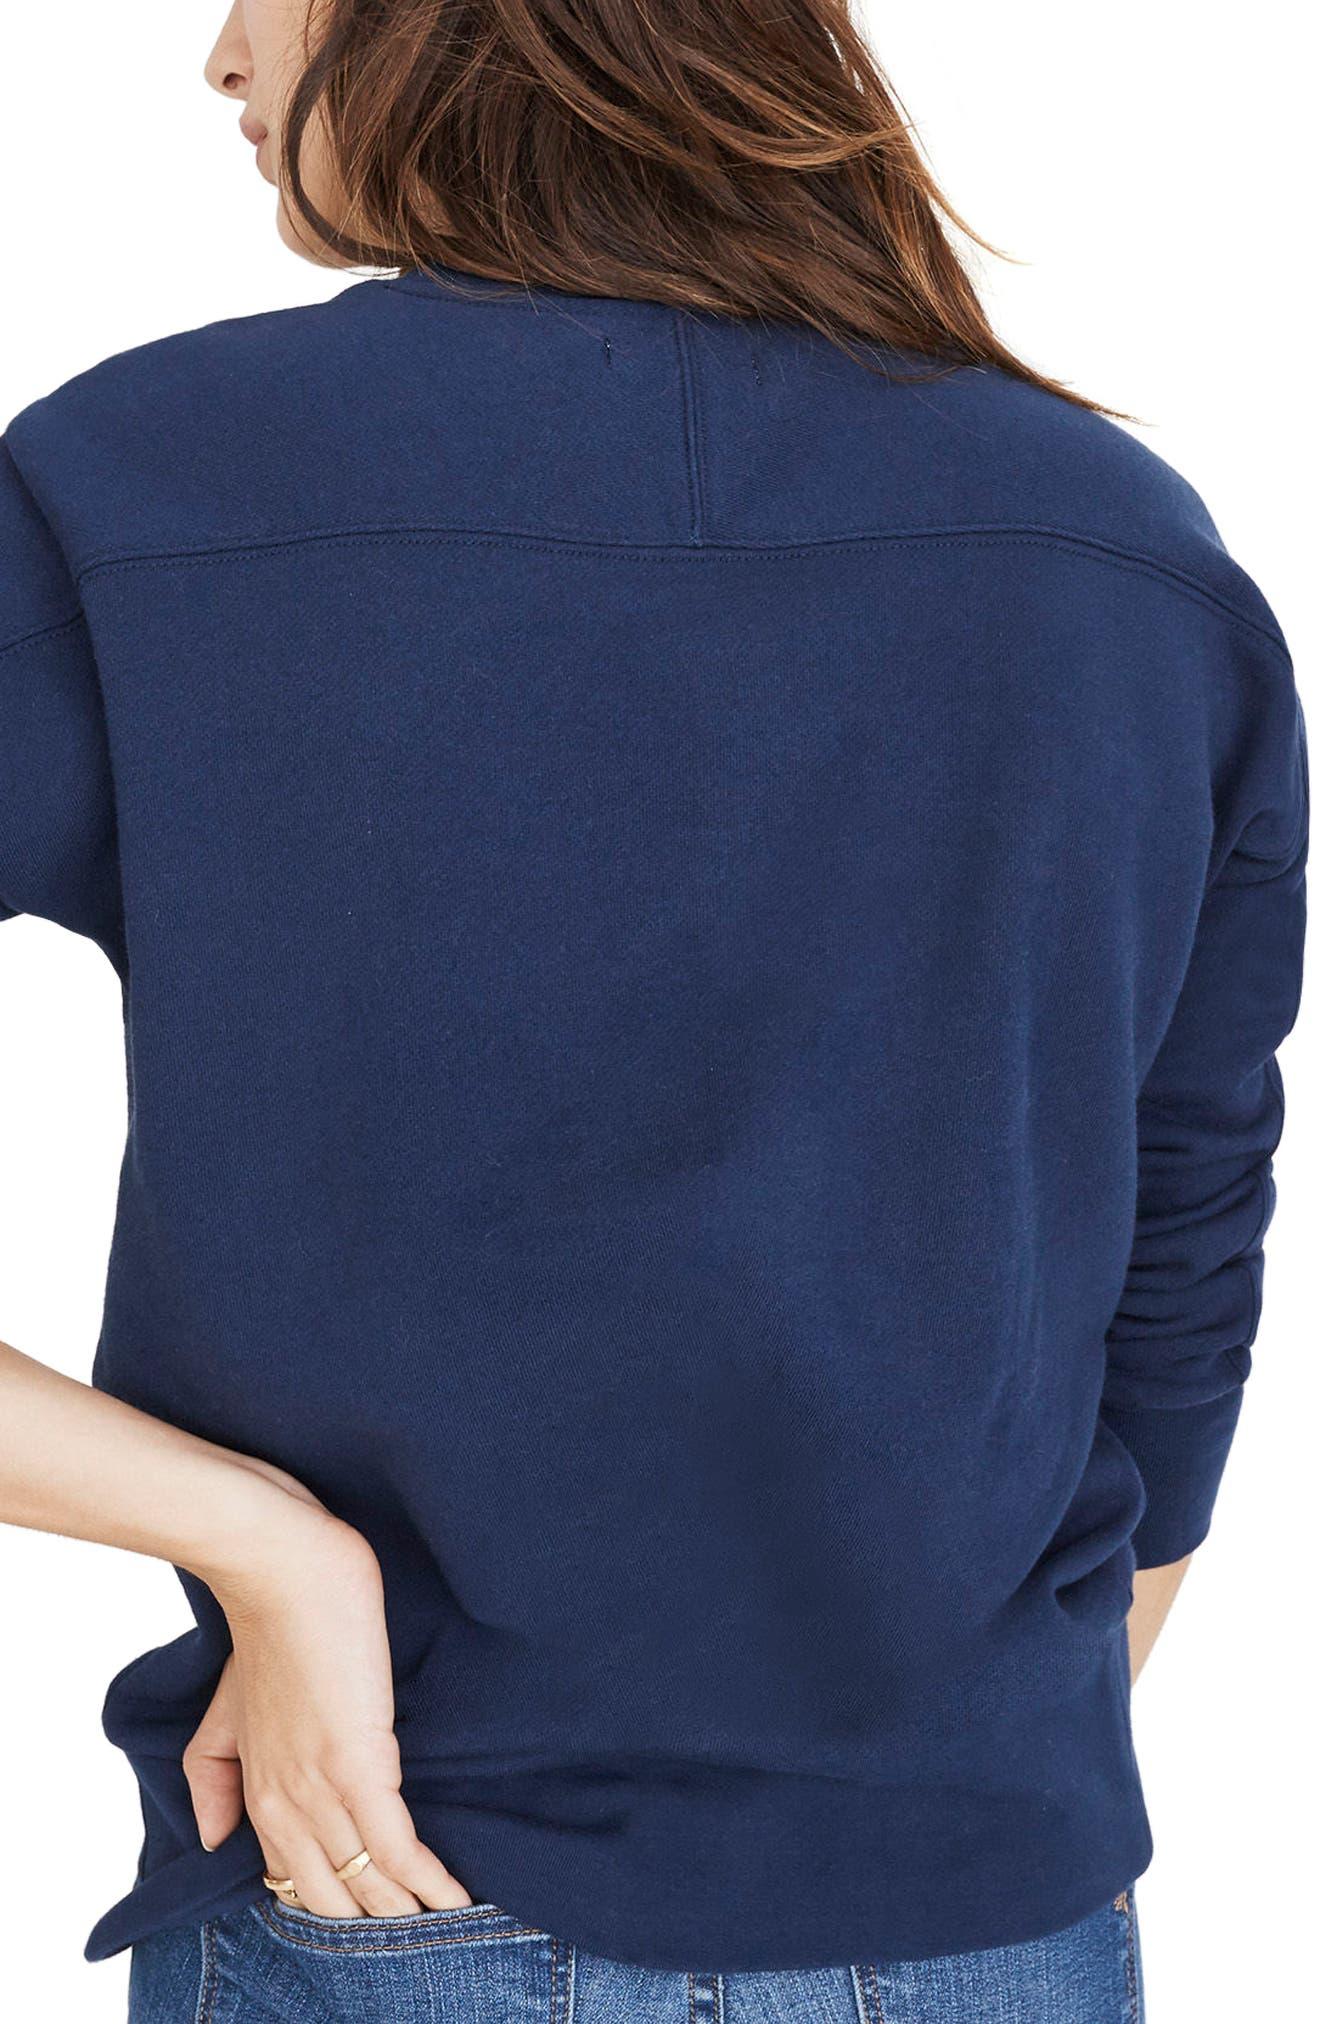 Starry Sweatshirt,                             Alternate thumbnail 2, color,                             410